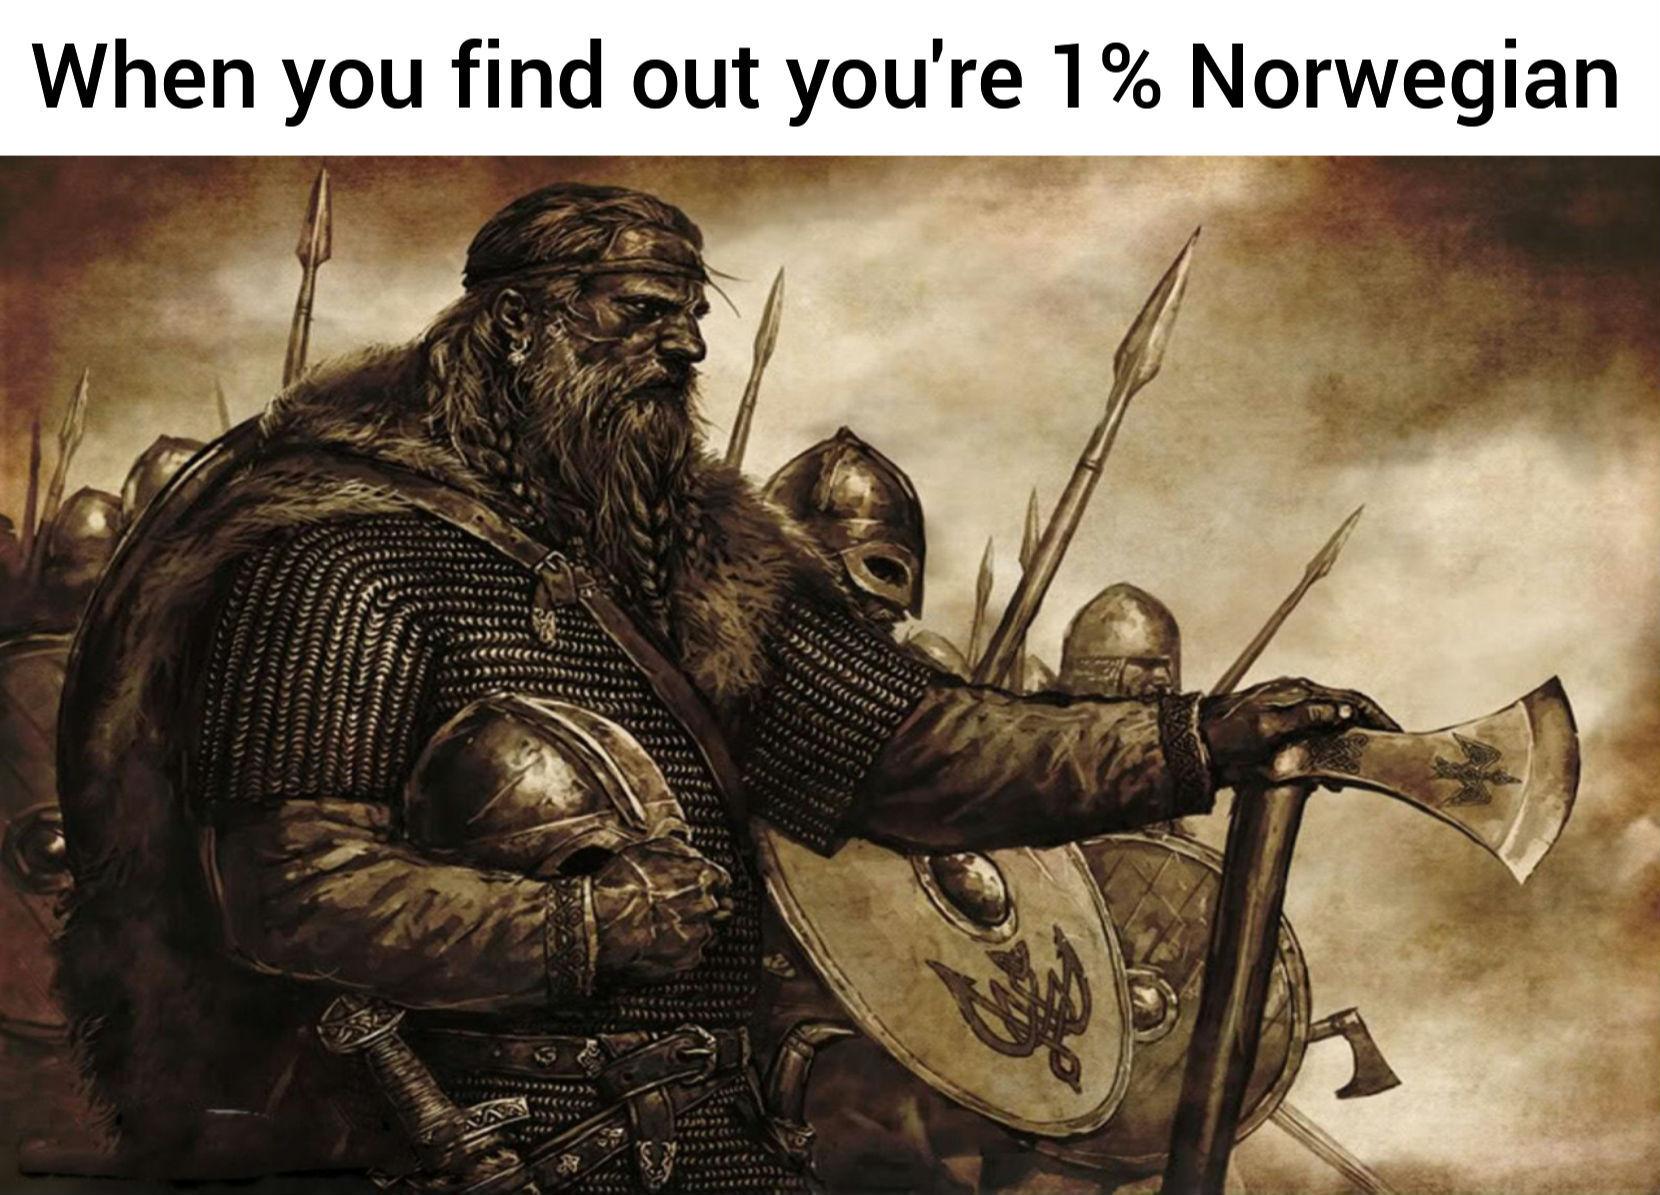 Time to raid England! - meme